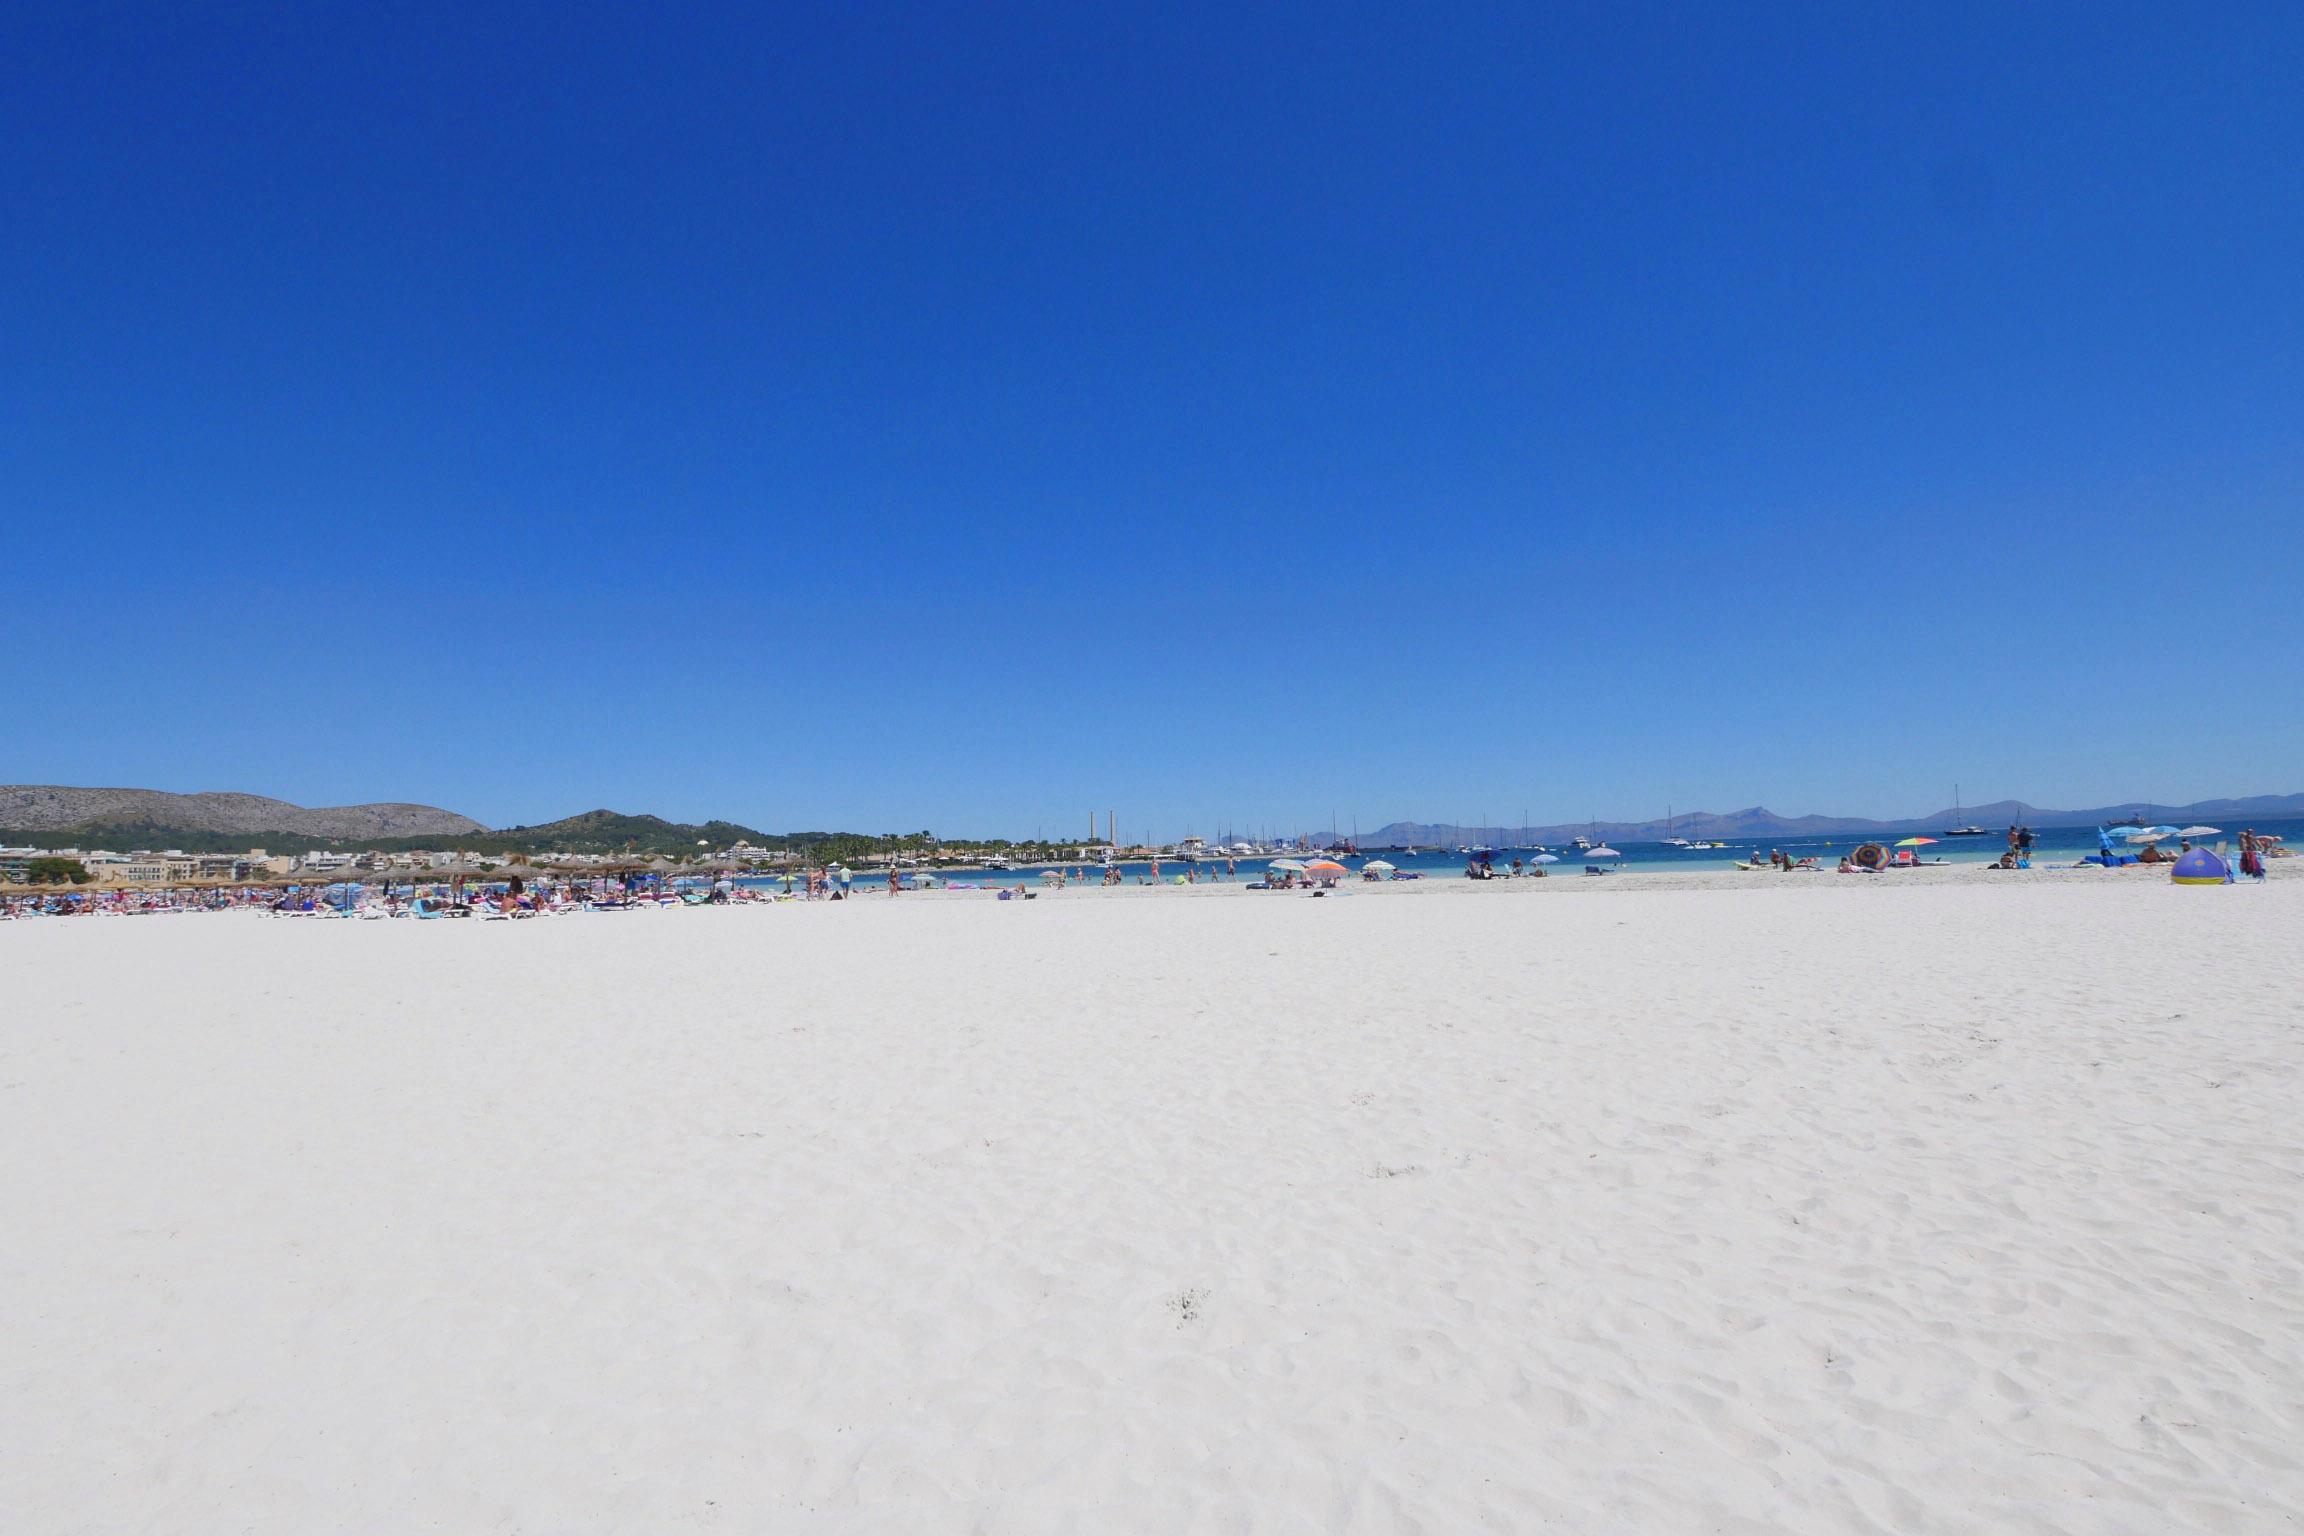 Playa de Alcudia auf Mallorca